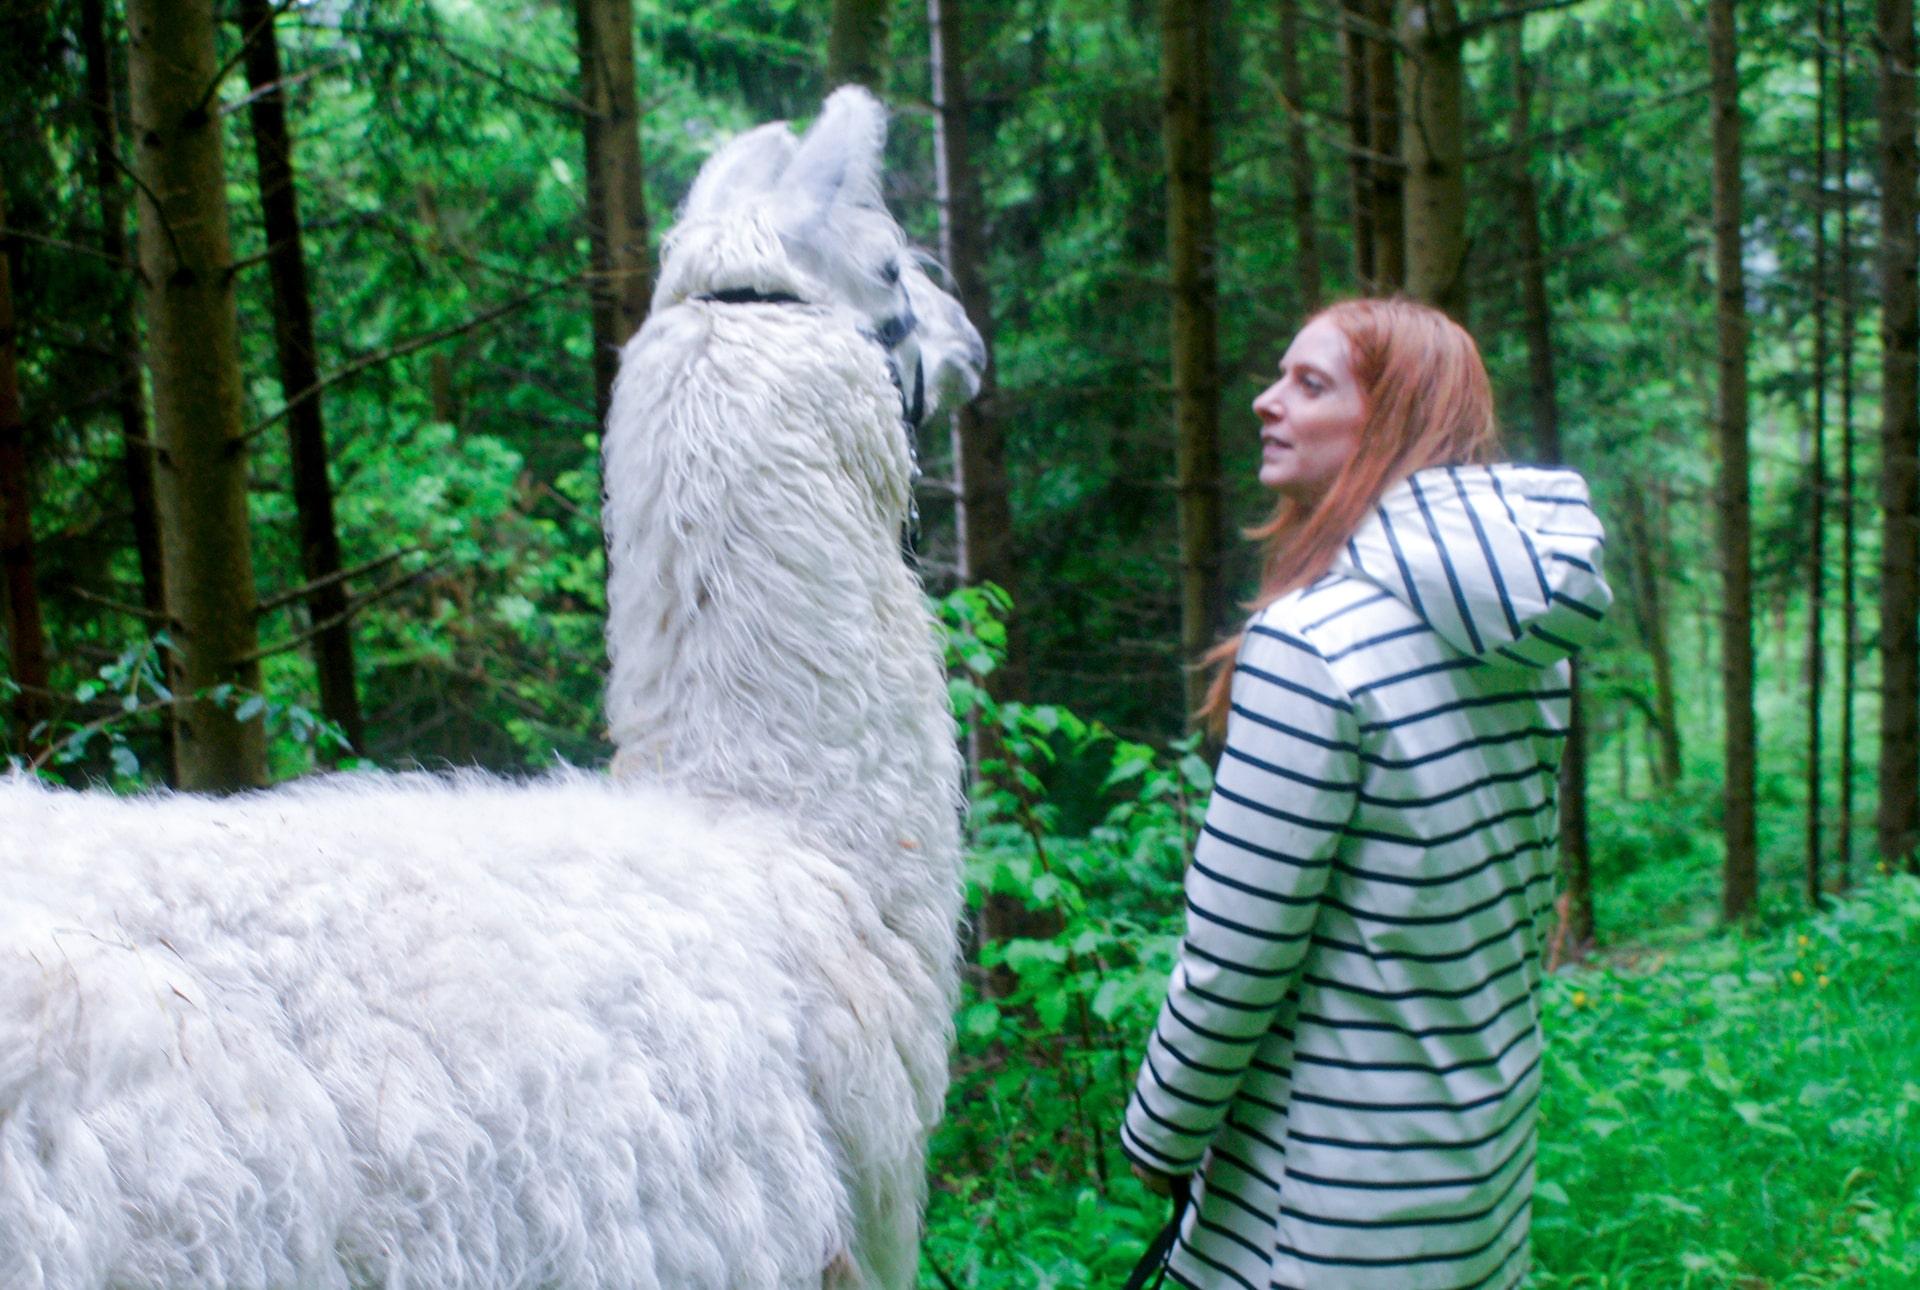 Blog Lifestyle - Merlin, le lama blanc de Lampaga - Suivre sa Joie - Saskia Parein